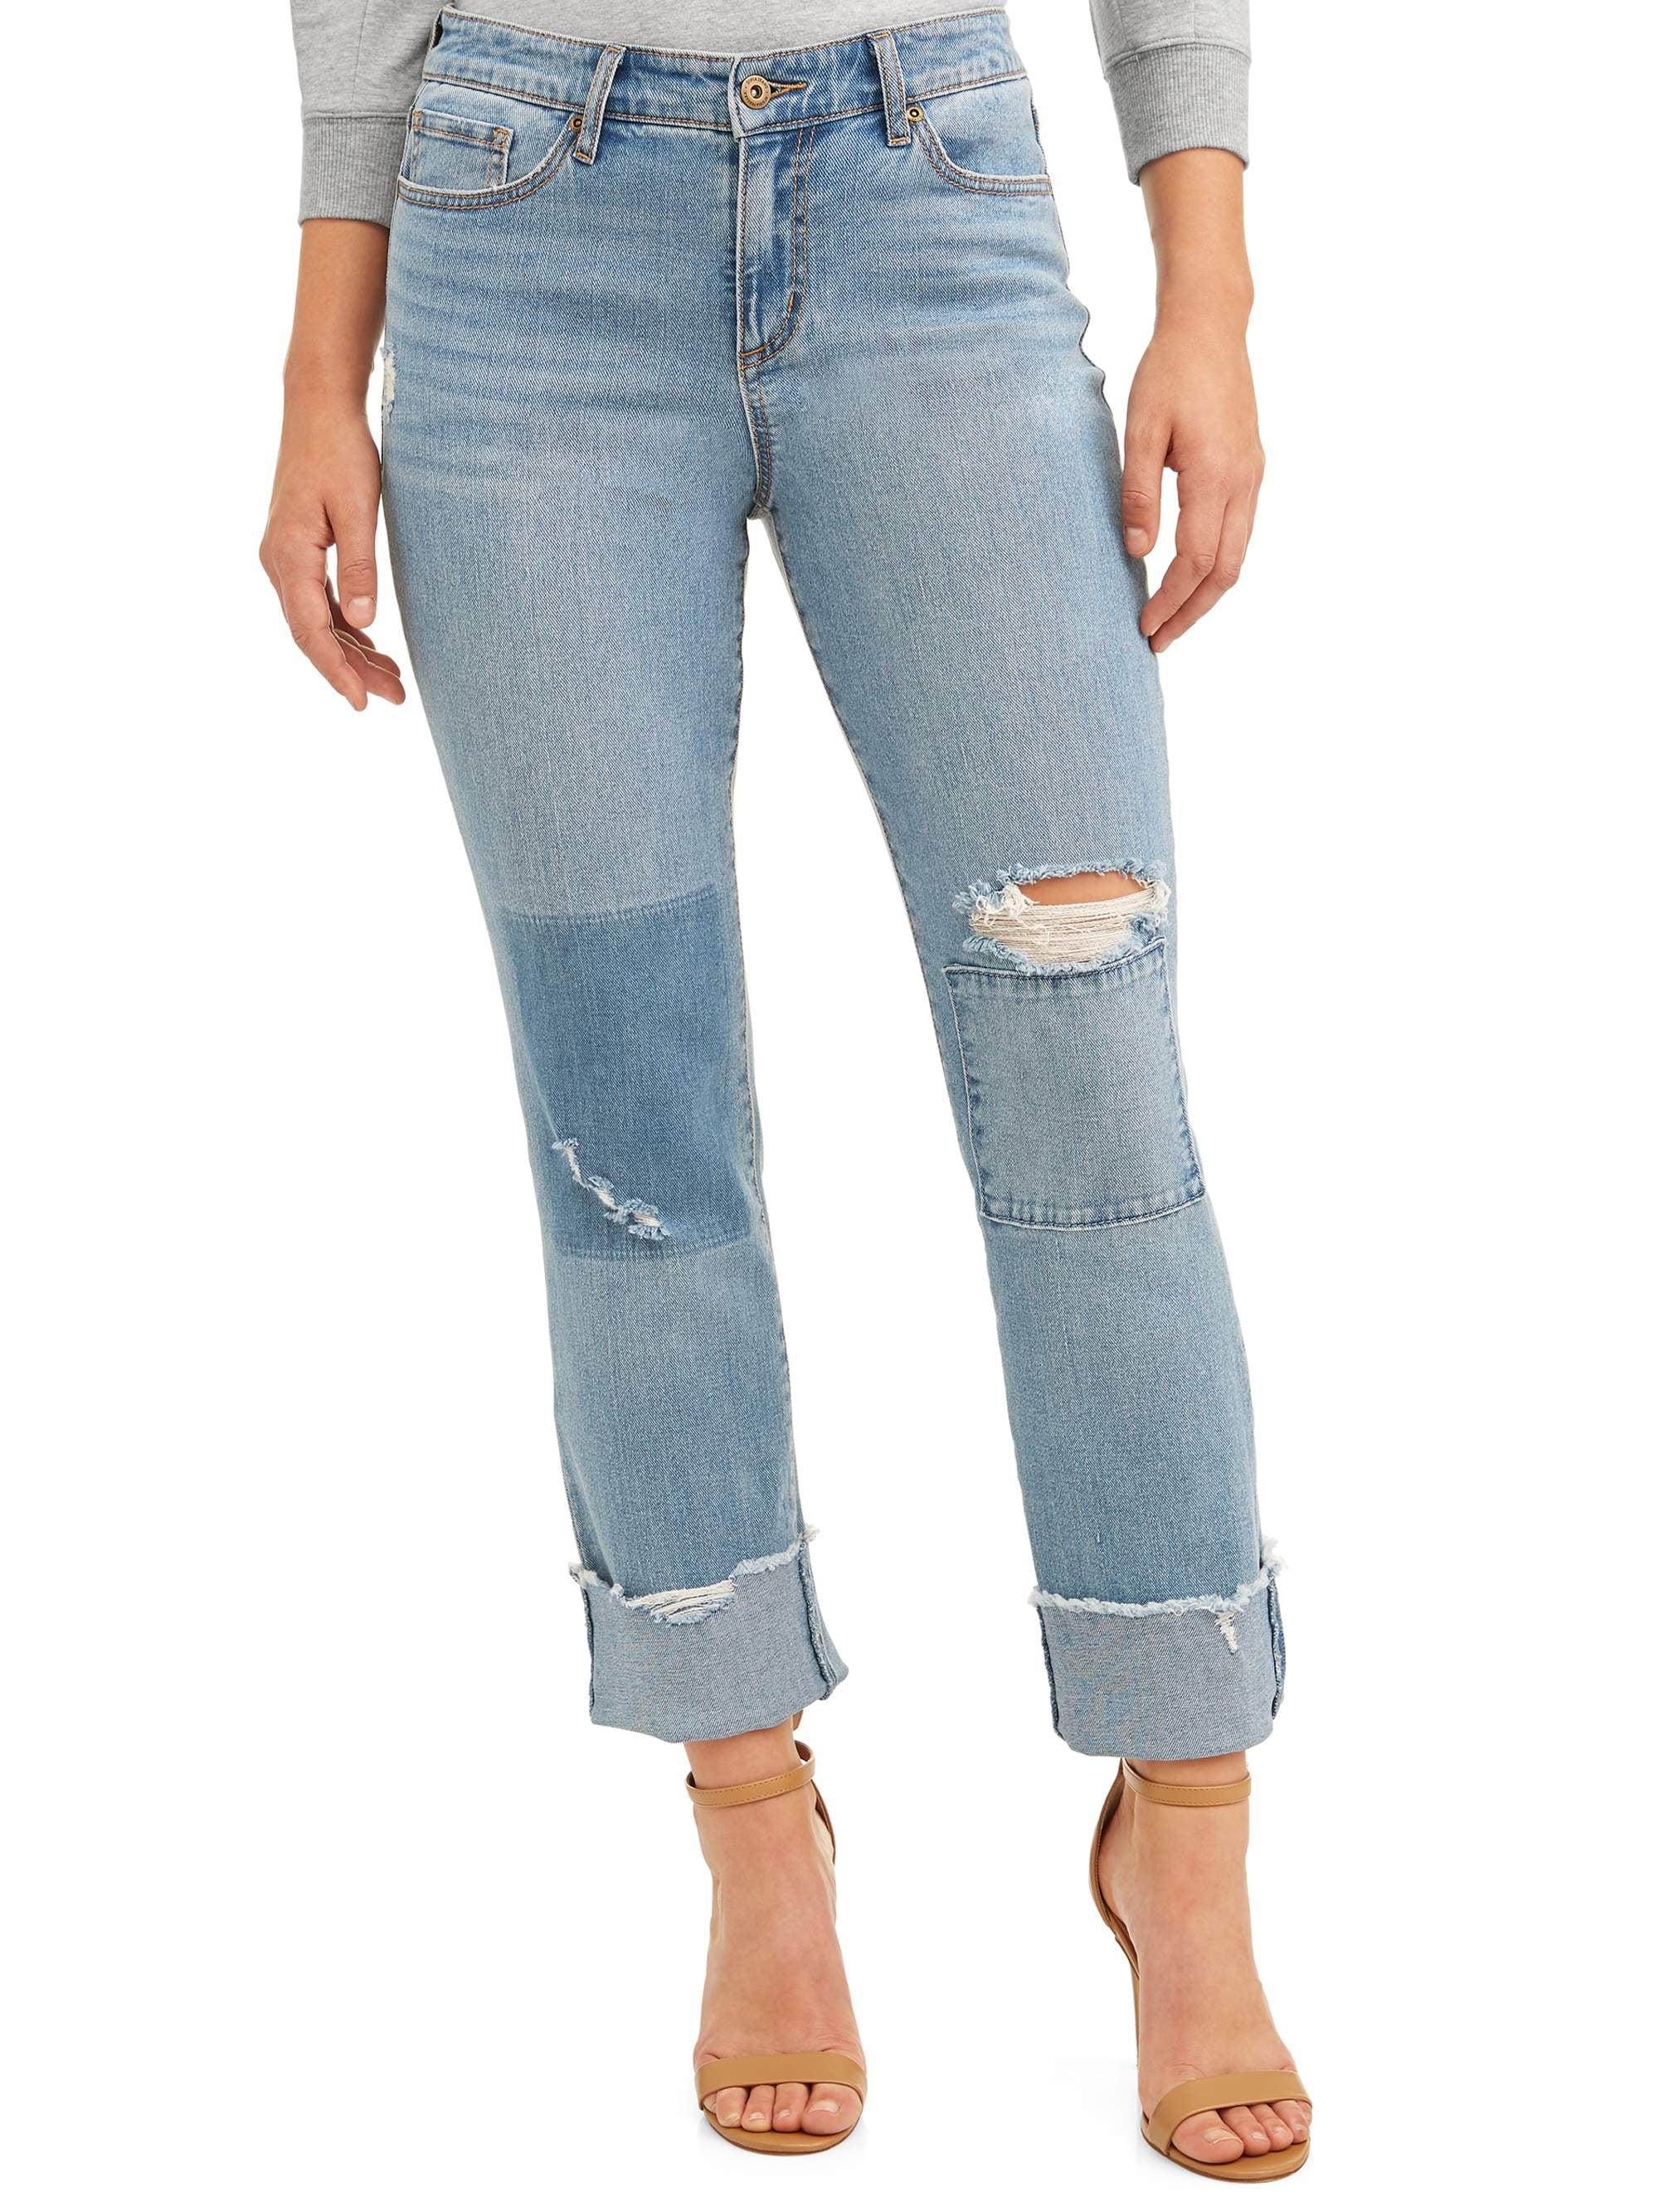 promo code 2bca9 06a00 como nuevo Ropa de mujer Faldas Zara Woman mini jeans rock ...